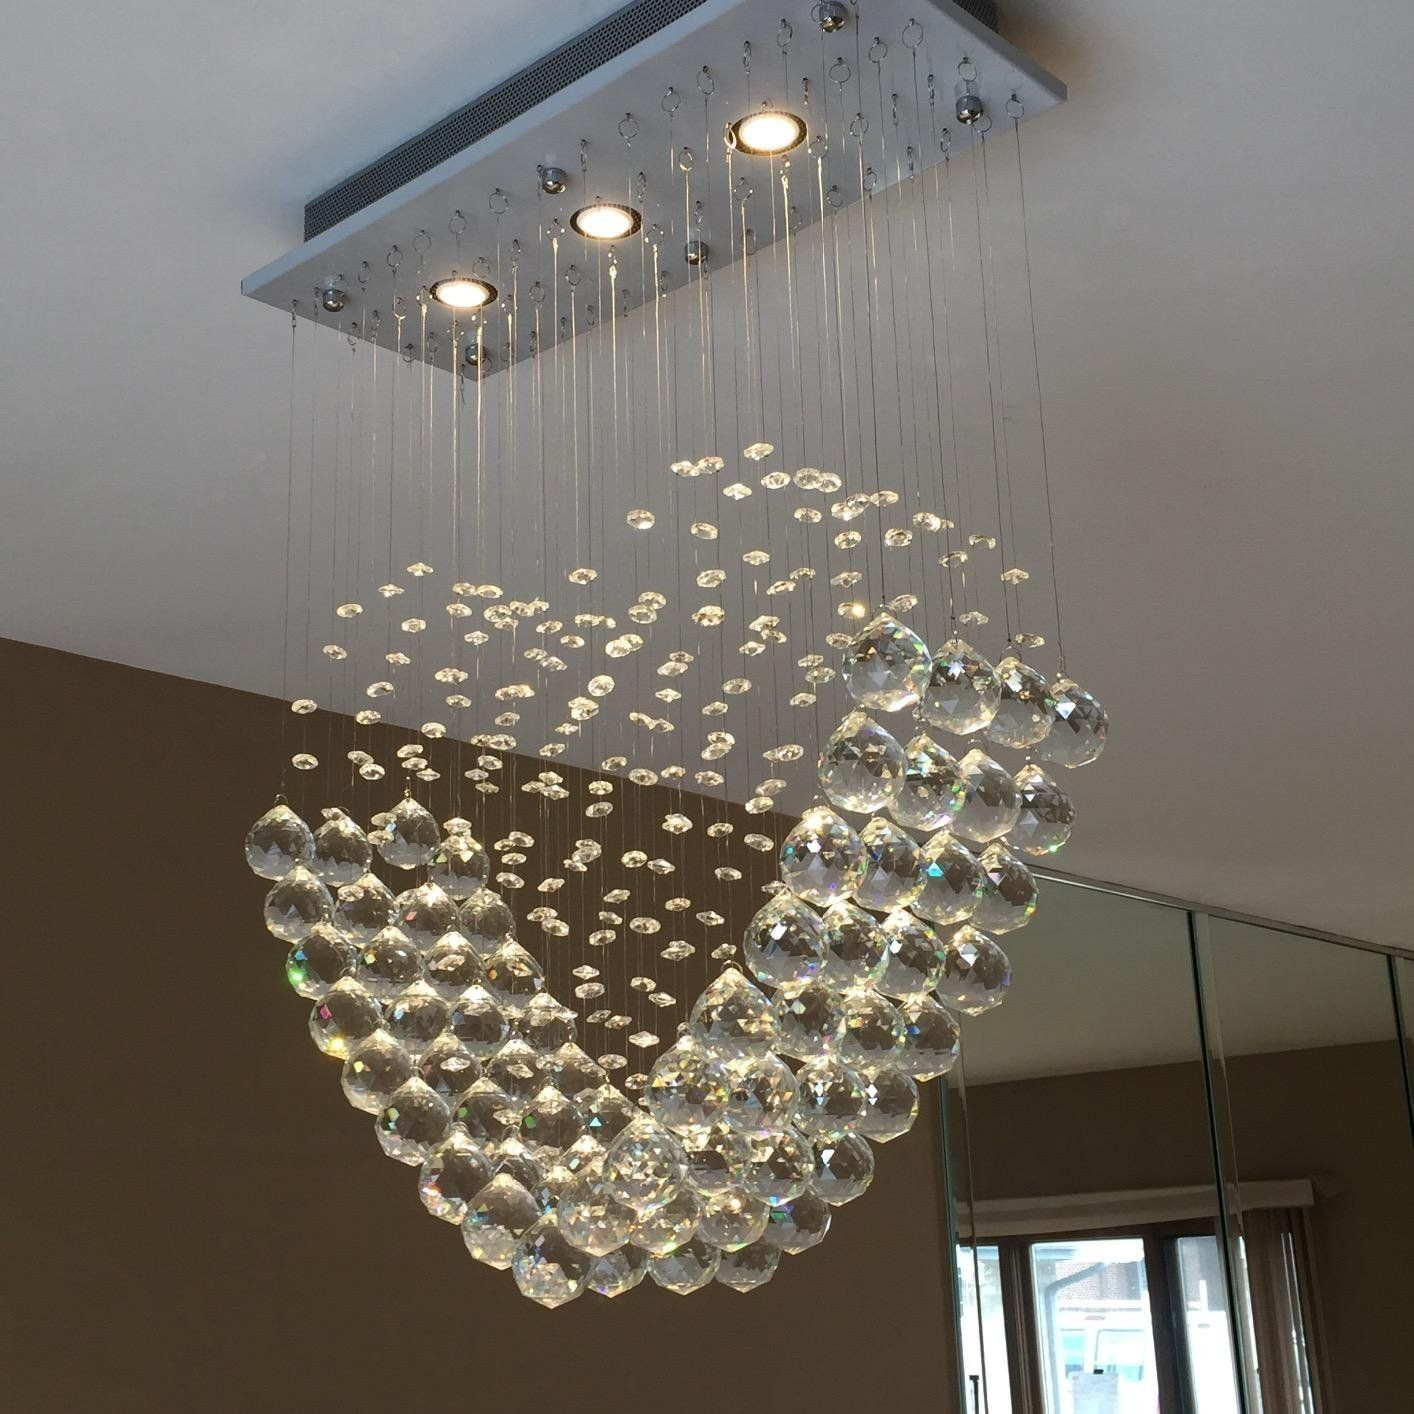 Dst Modern Heart Transparent Crystal Rain Drop Pendant Lamp Ceiling Light Chandelier Ligh Pendant Ceiling Lamp Romantic Bedroom Lighting Ceiling Pendant Lights